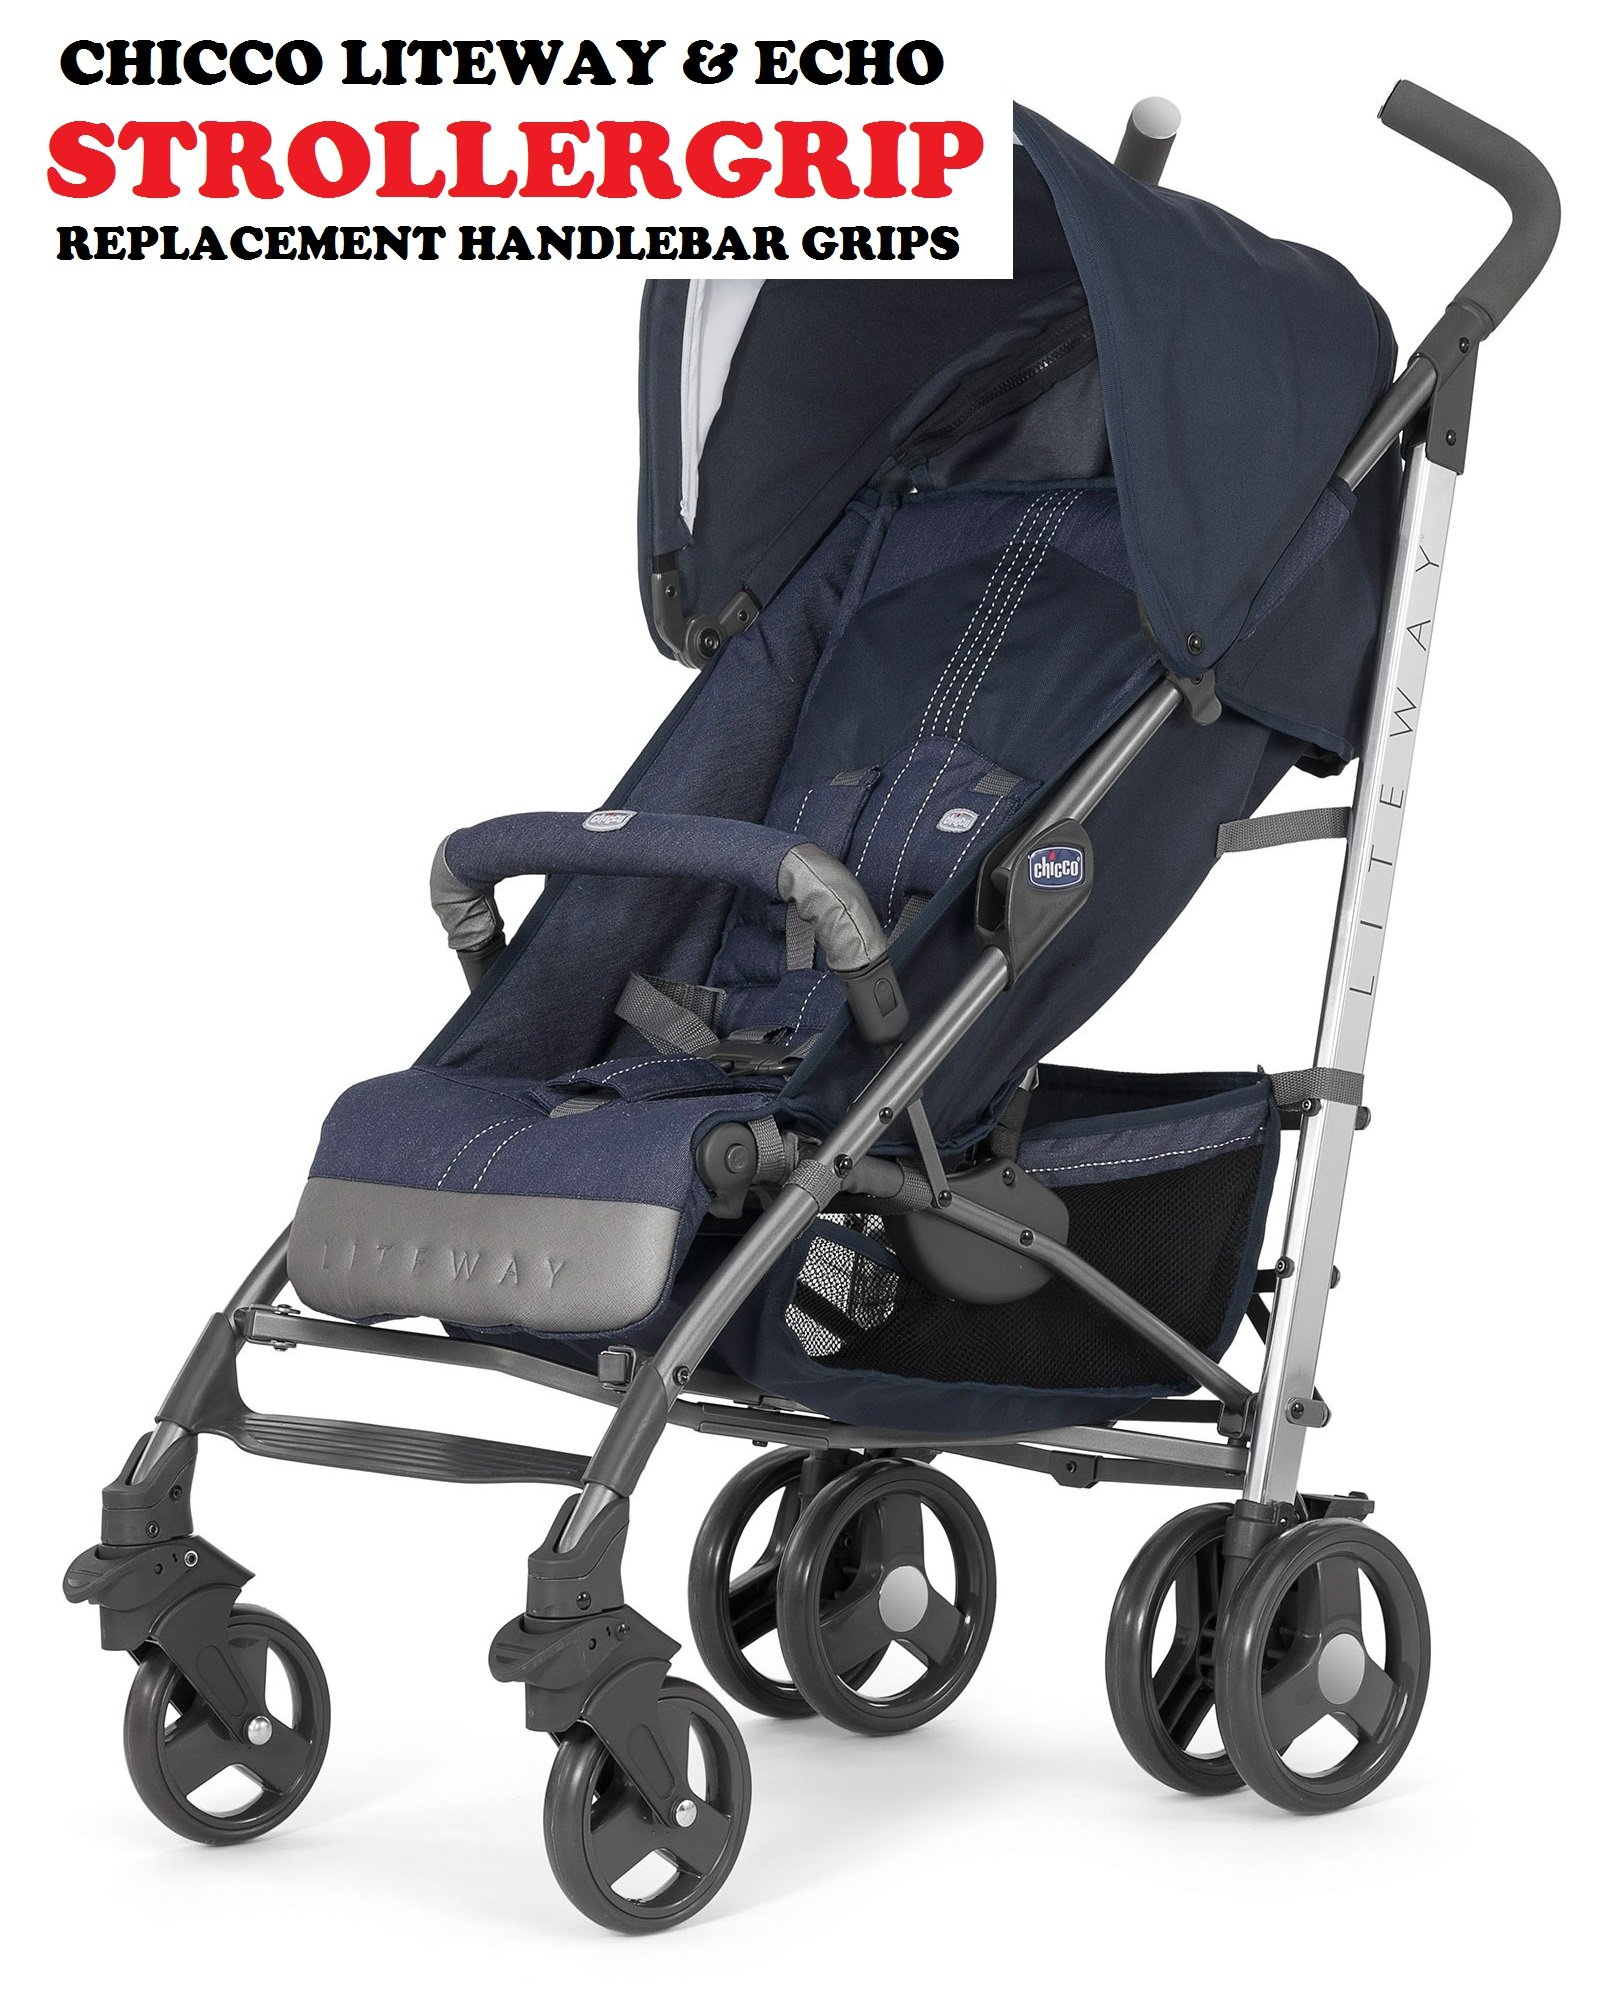 Amazon.com : Choopie Stroller Grip Covers, Just Black